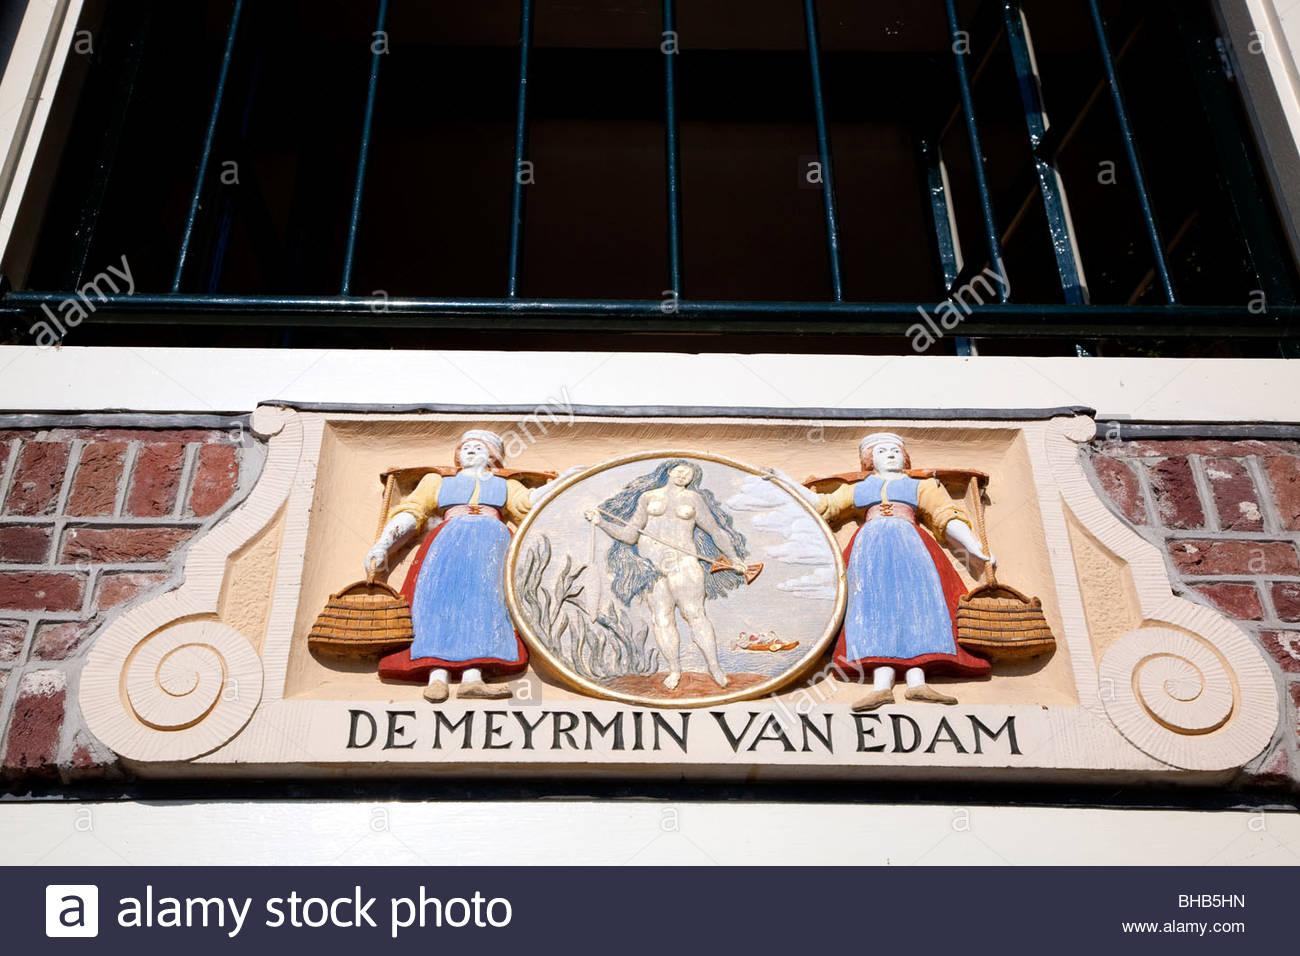 Benelux Cheese Market cultural Dutch Edam Europe Holland Nederland sign De Meyrmin van Edam The Netherlands town - Stock Image